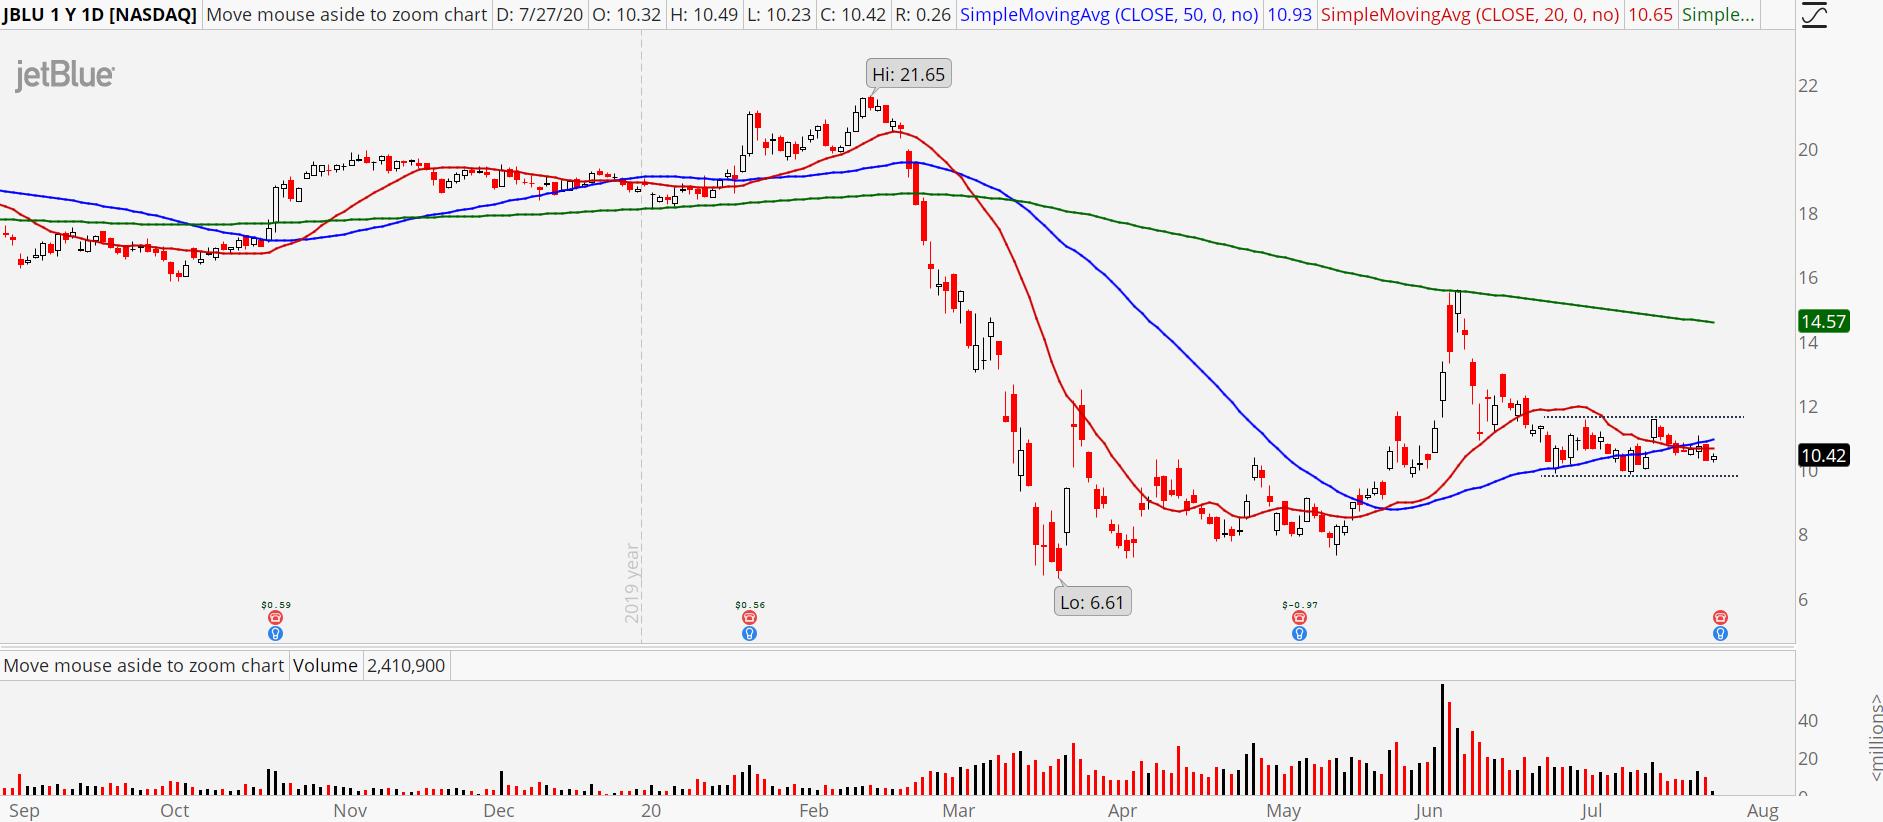 JetBlue (JBLU) stock chart showing narrow trading range